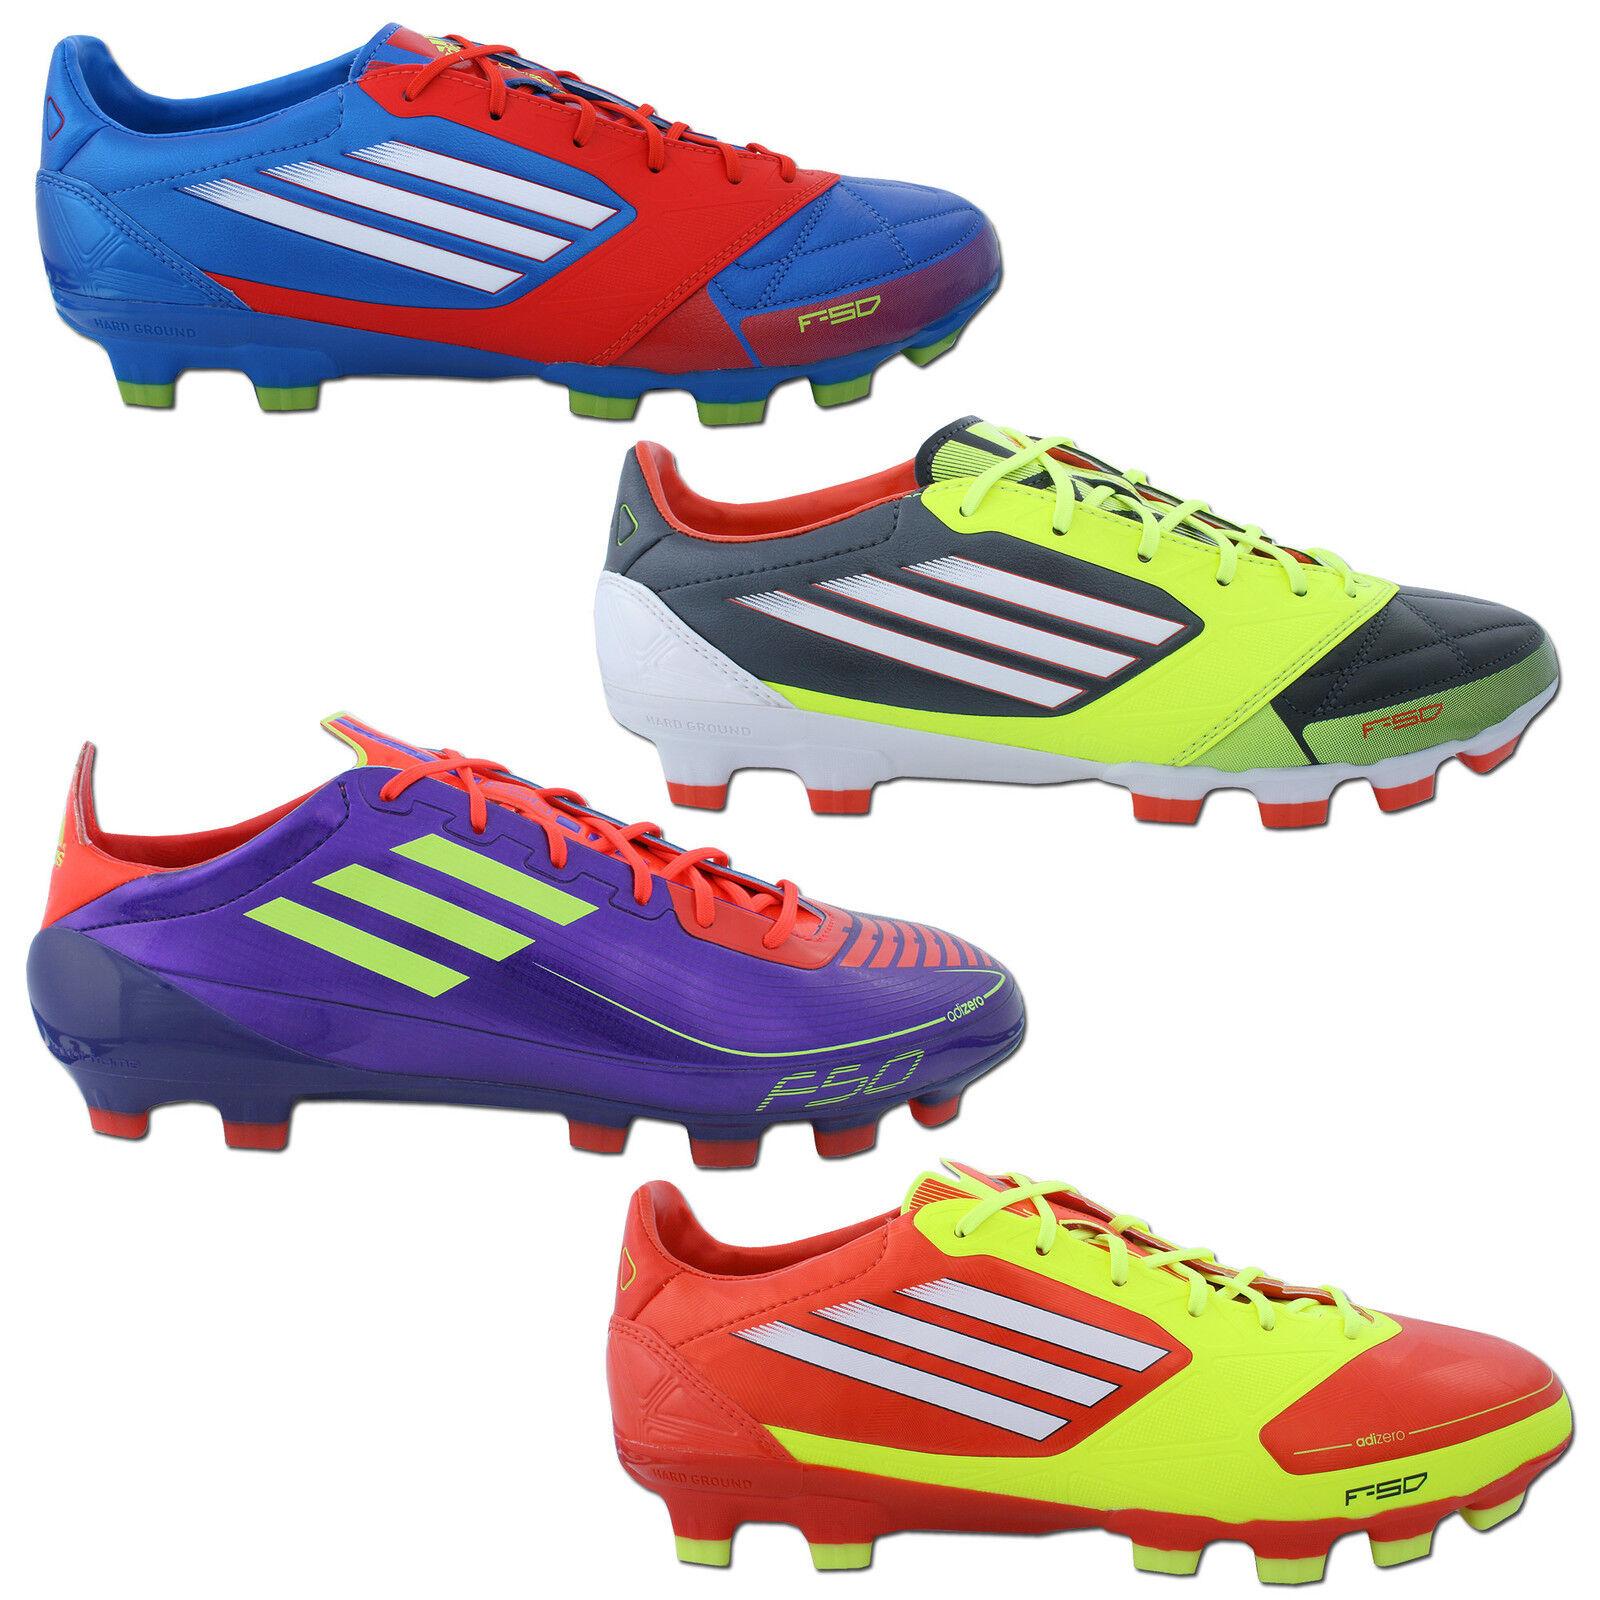 Adidas F50 Adizero TRX Hg Leather and Syn Football shoes Fg Sg New Soccer 39-48